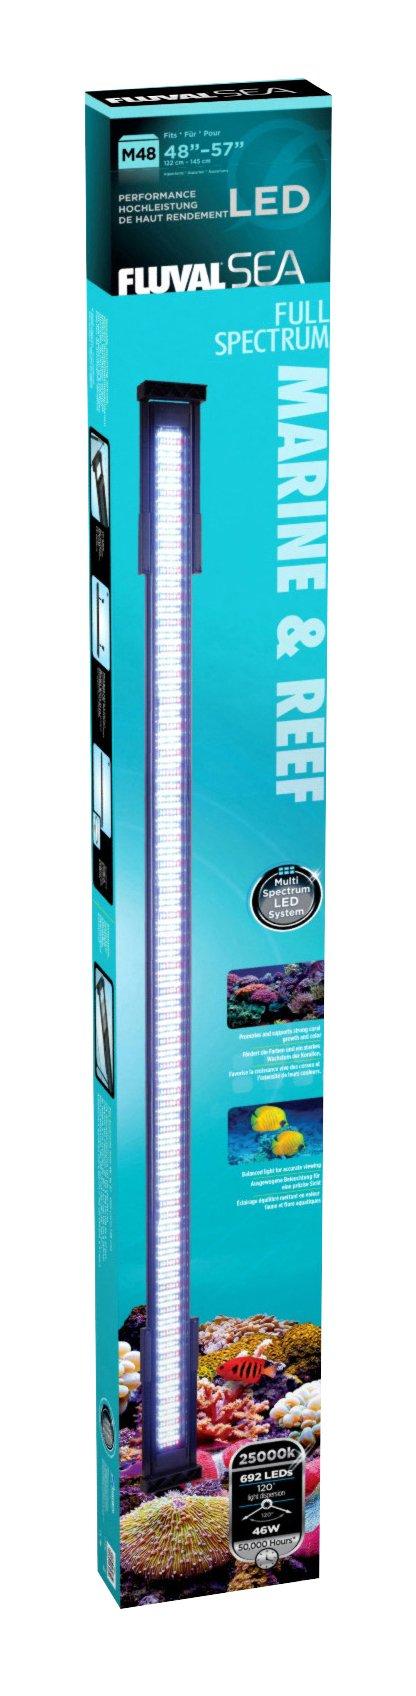 Fluval Led 48 Inch Marine Lamp 46 Watt Fluval Aquarium